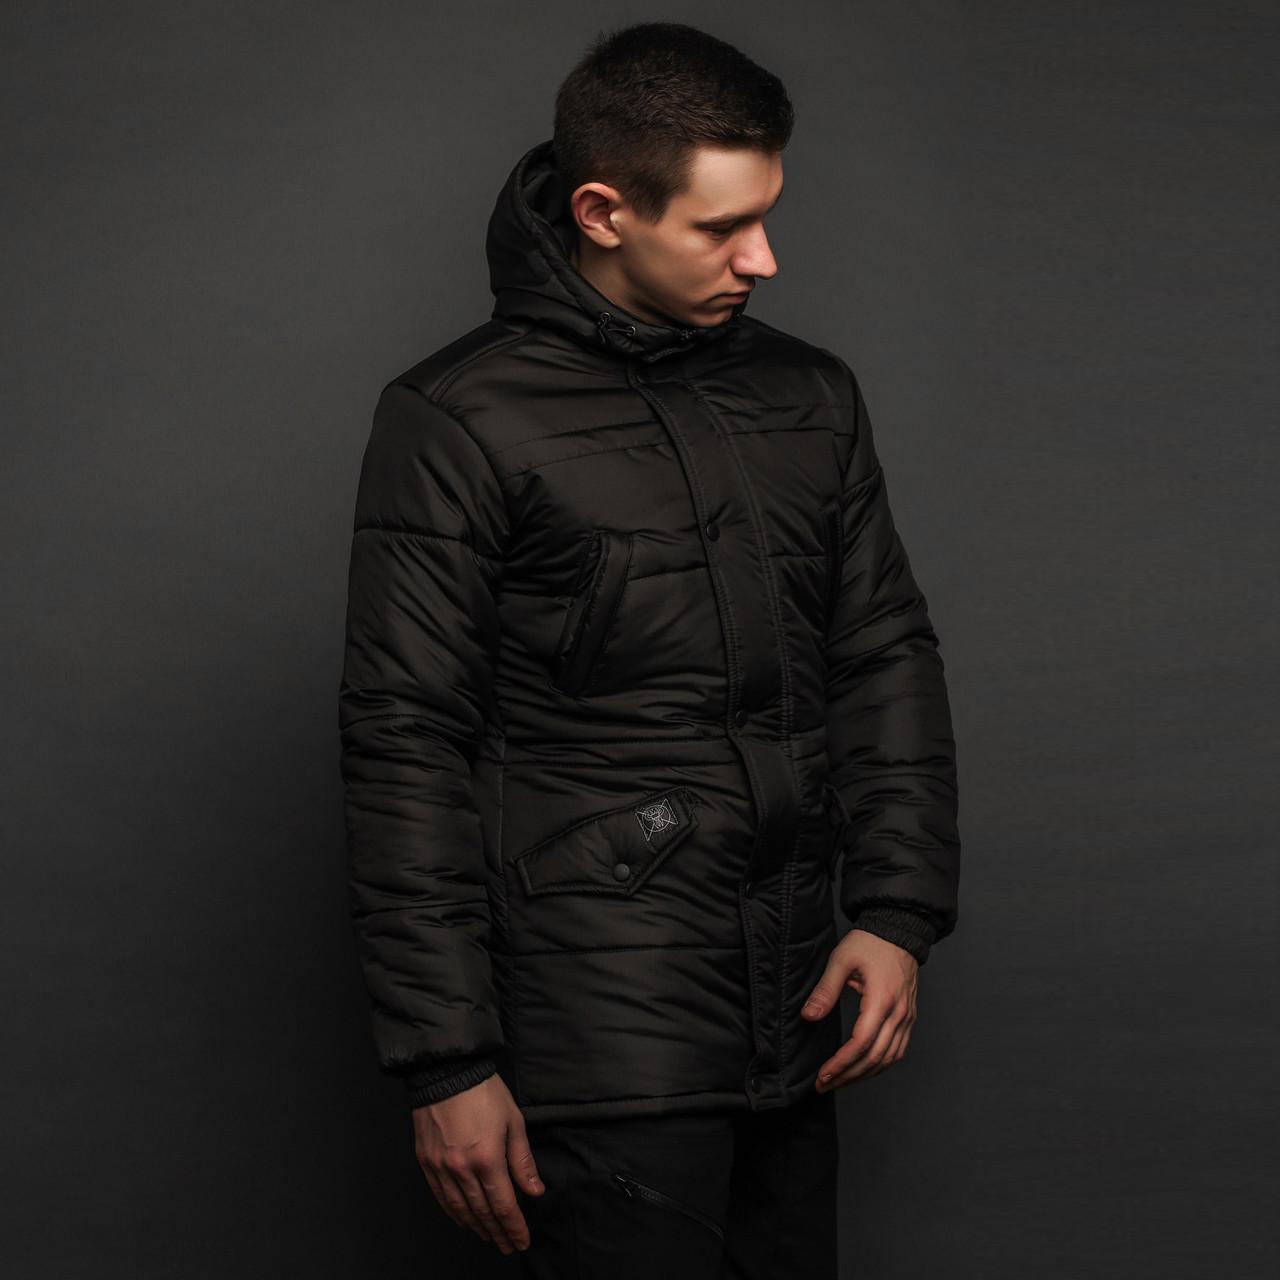 Зимняя куртка парка мужская черная бренд ТУР модель Бизон (Bizon) размер S 351367a8fa616